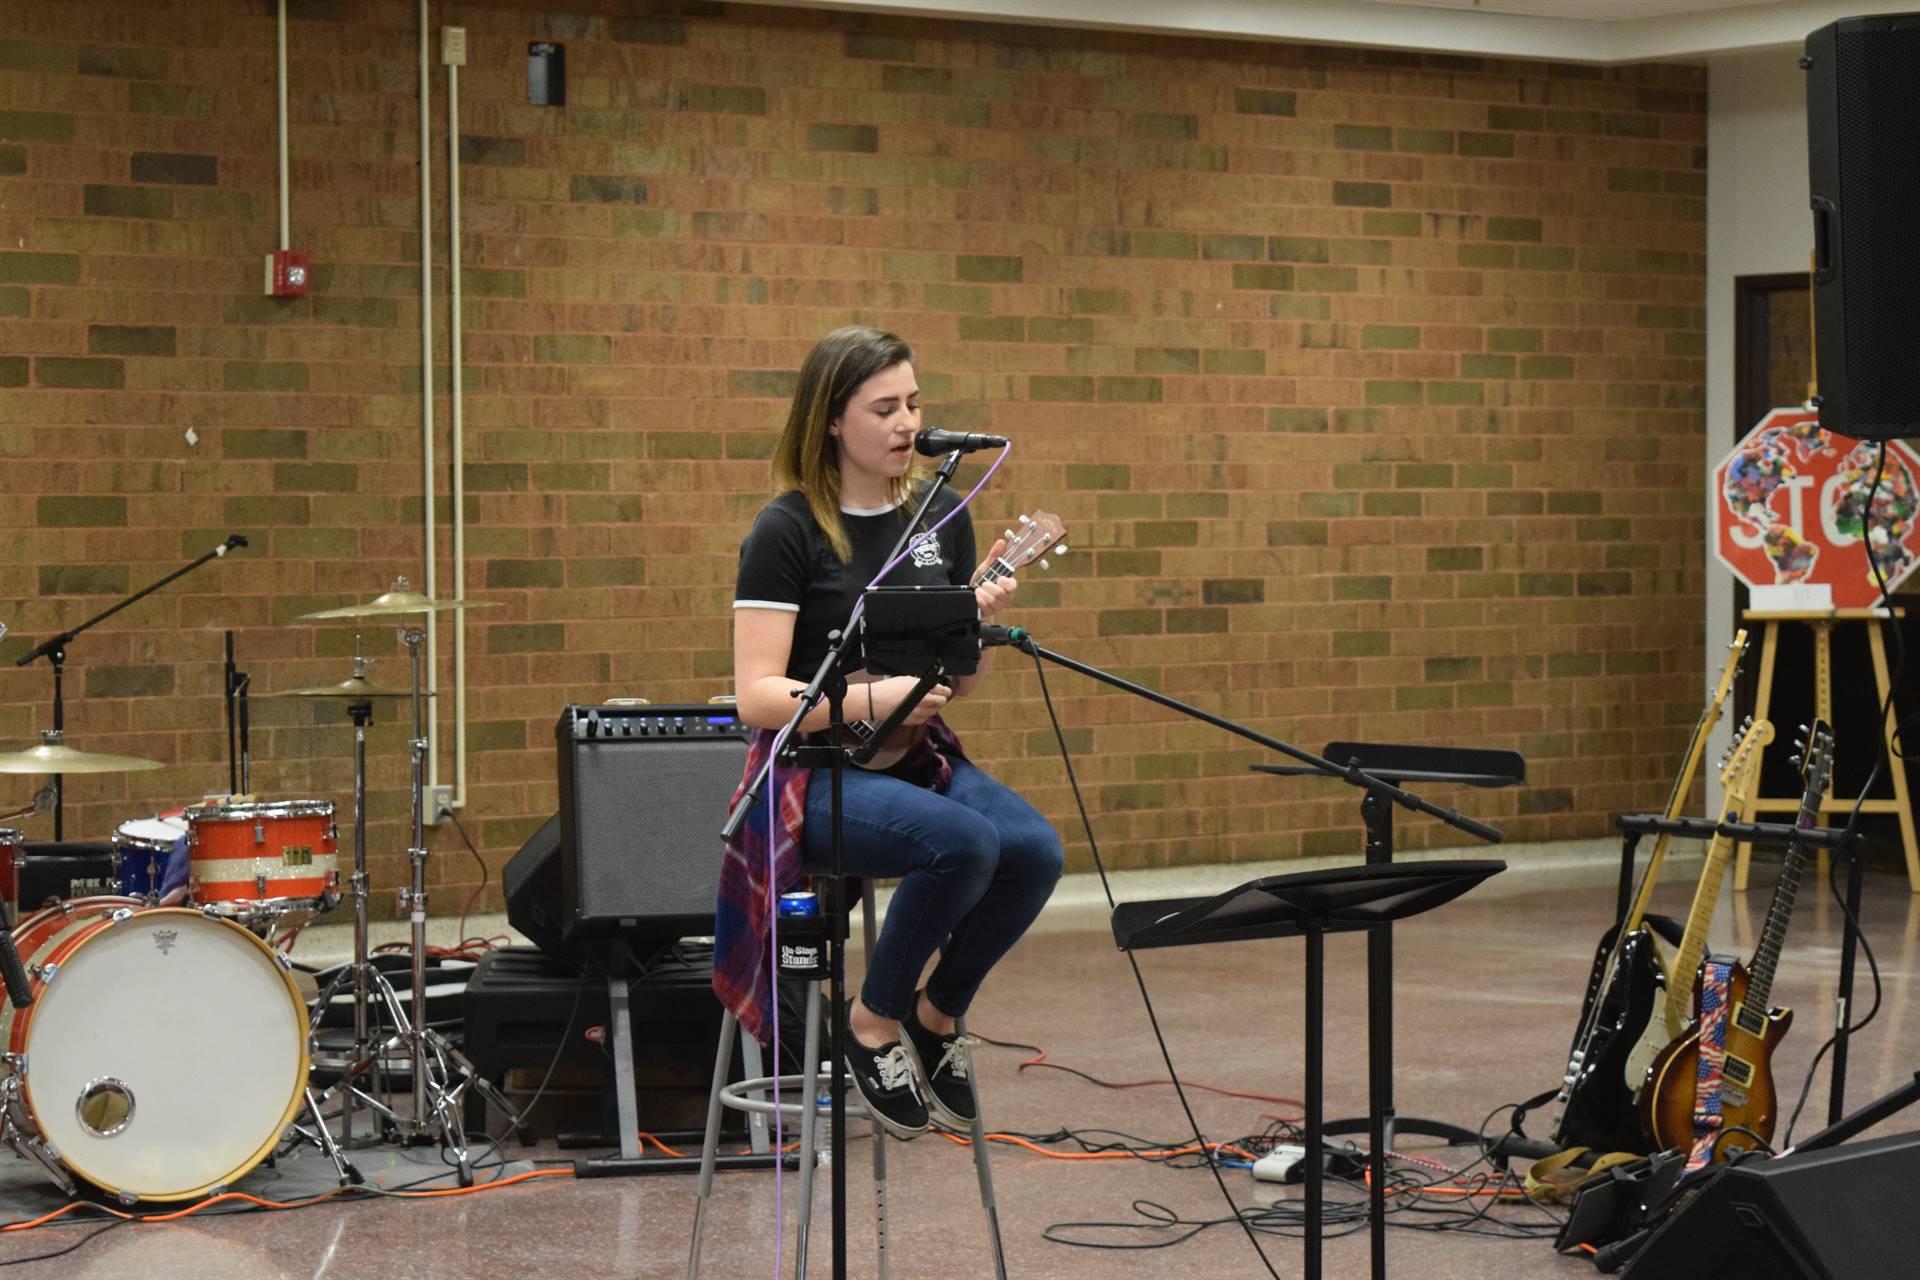 female student solo performance with a ukulele